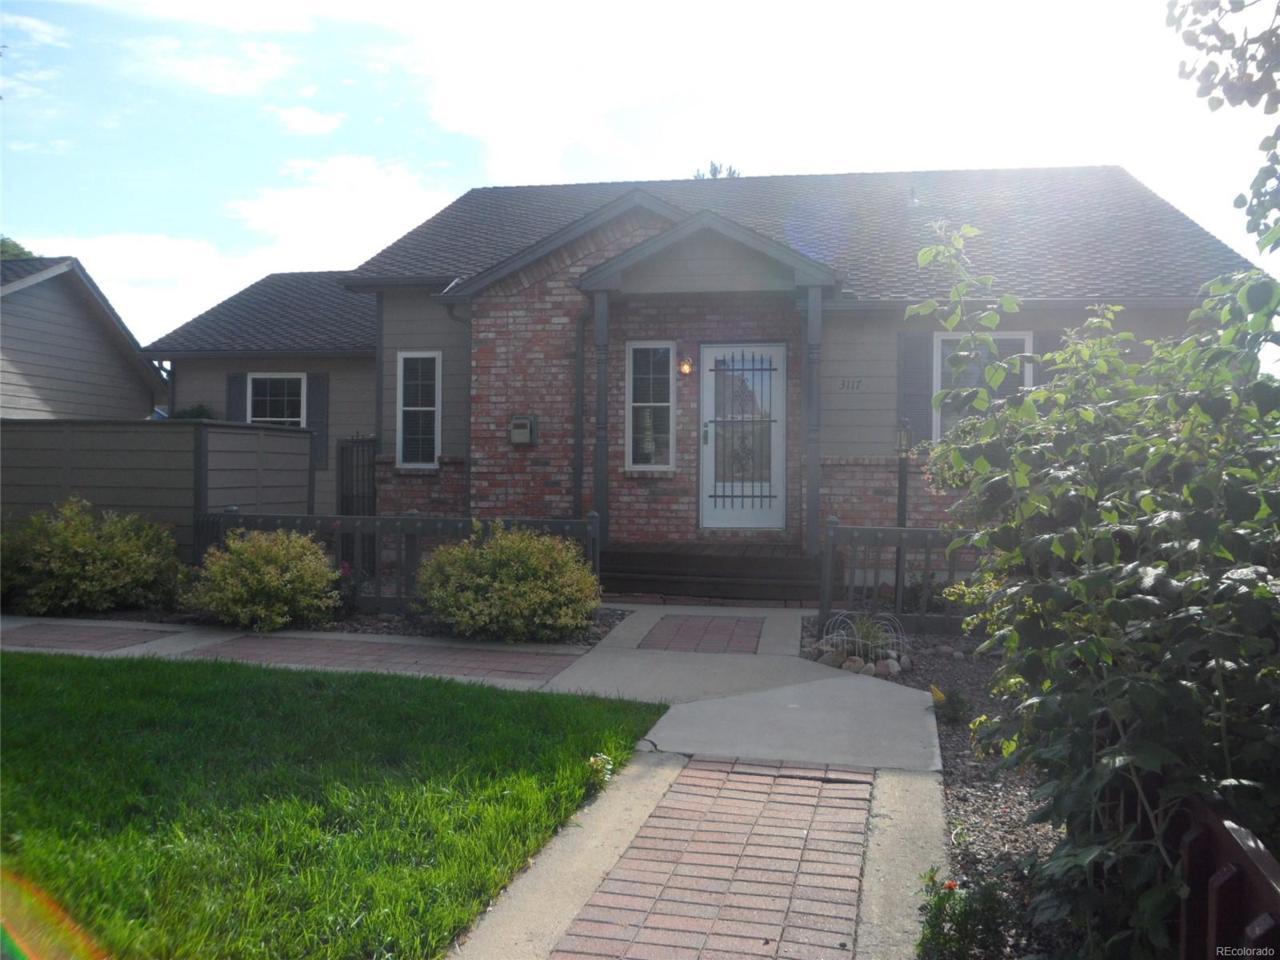 3117 Almeria Way, Longmont, CO 80503 (MLS #5587891) :: 8z Real Estate